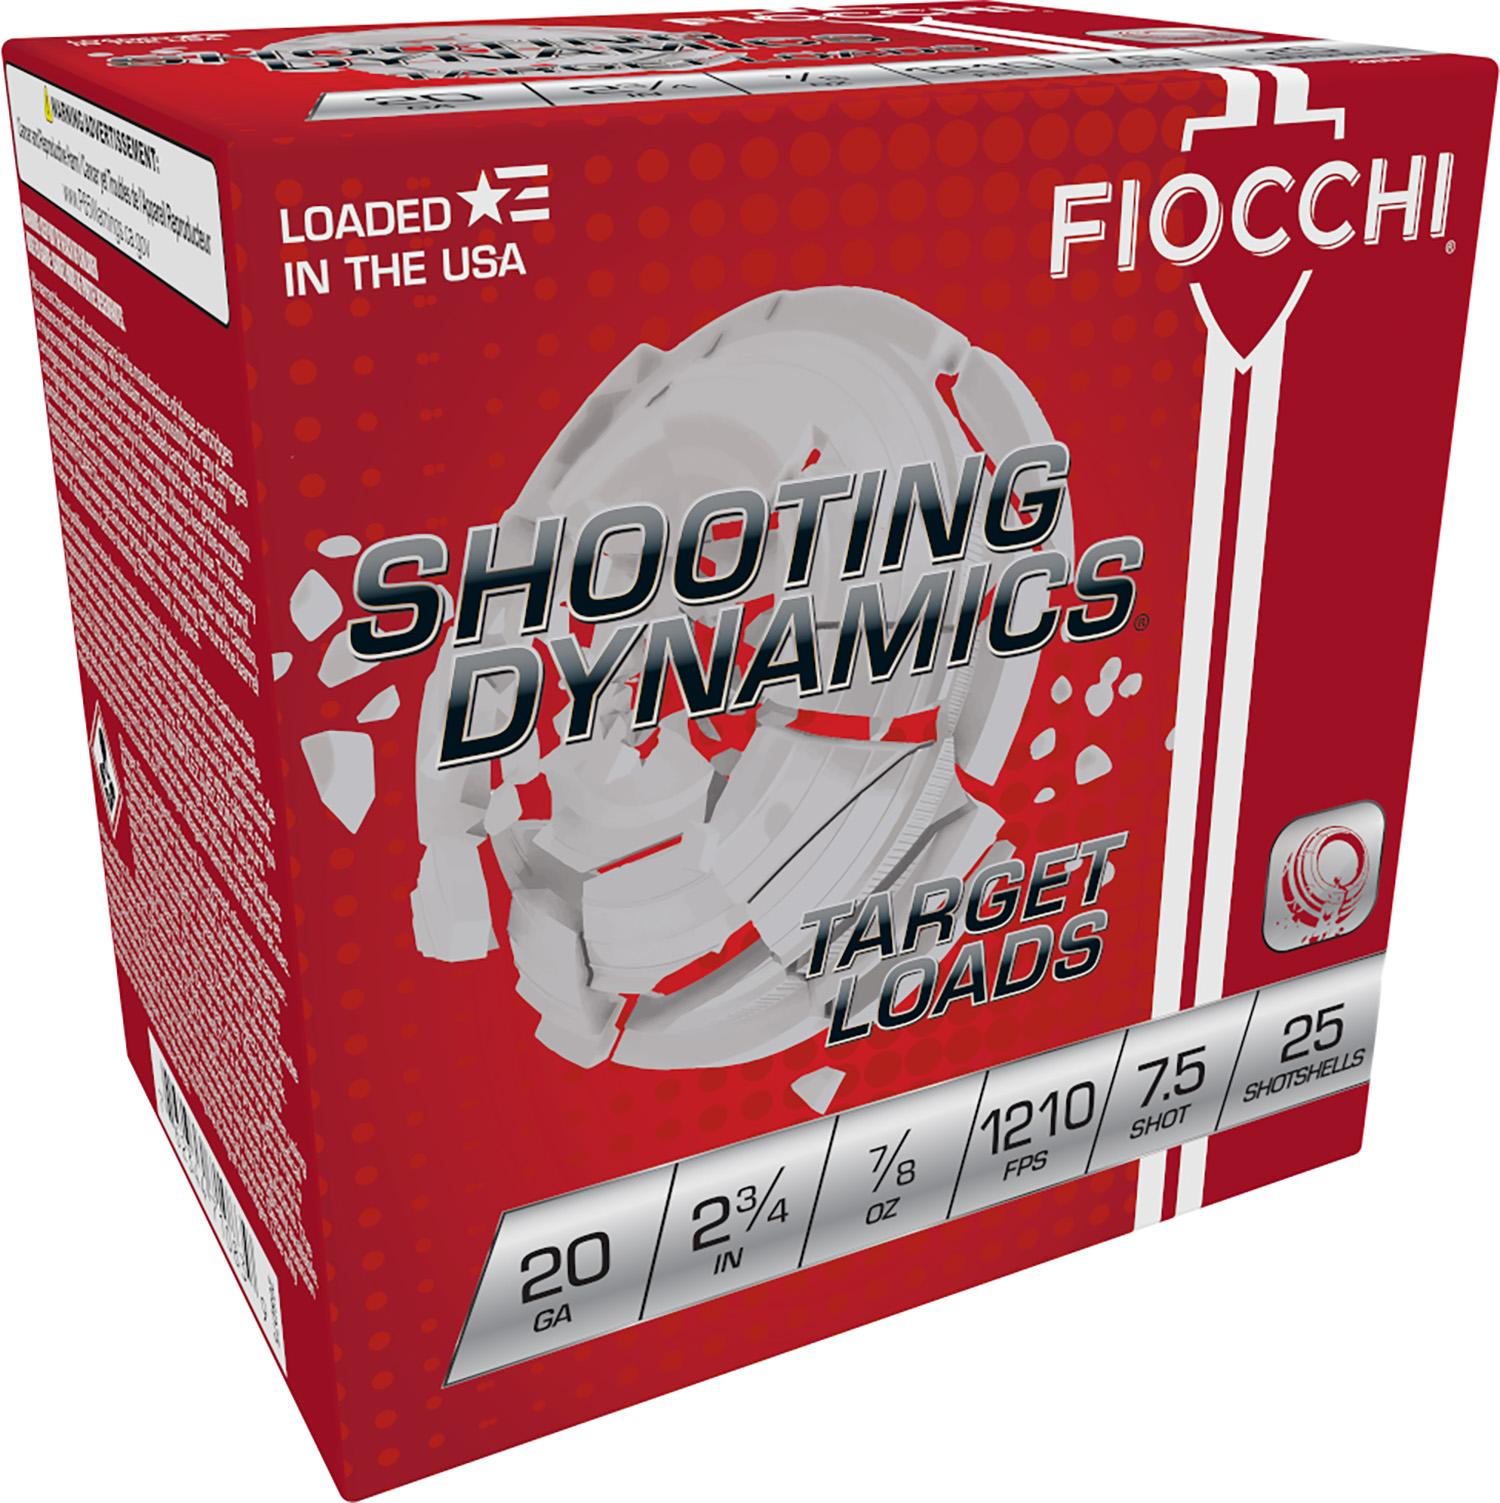 Fiocchi 20SD75 Shooting Dynamics Heavy Dynamic 20 Gauge 2.75